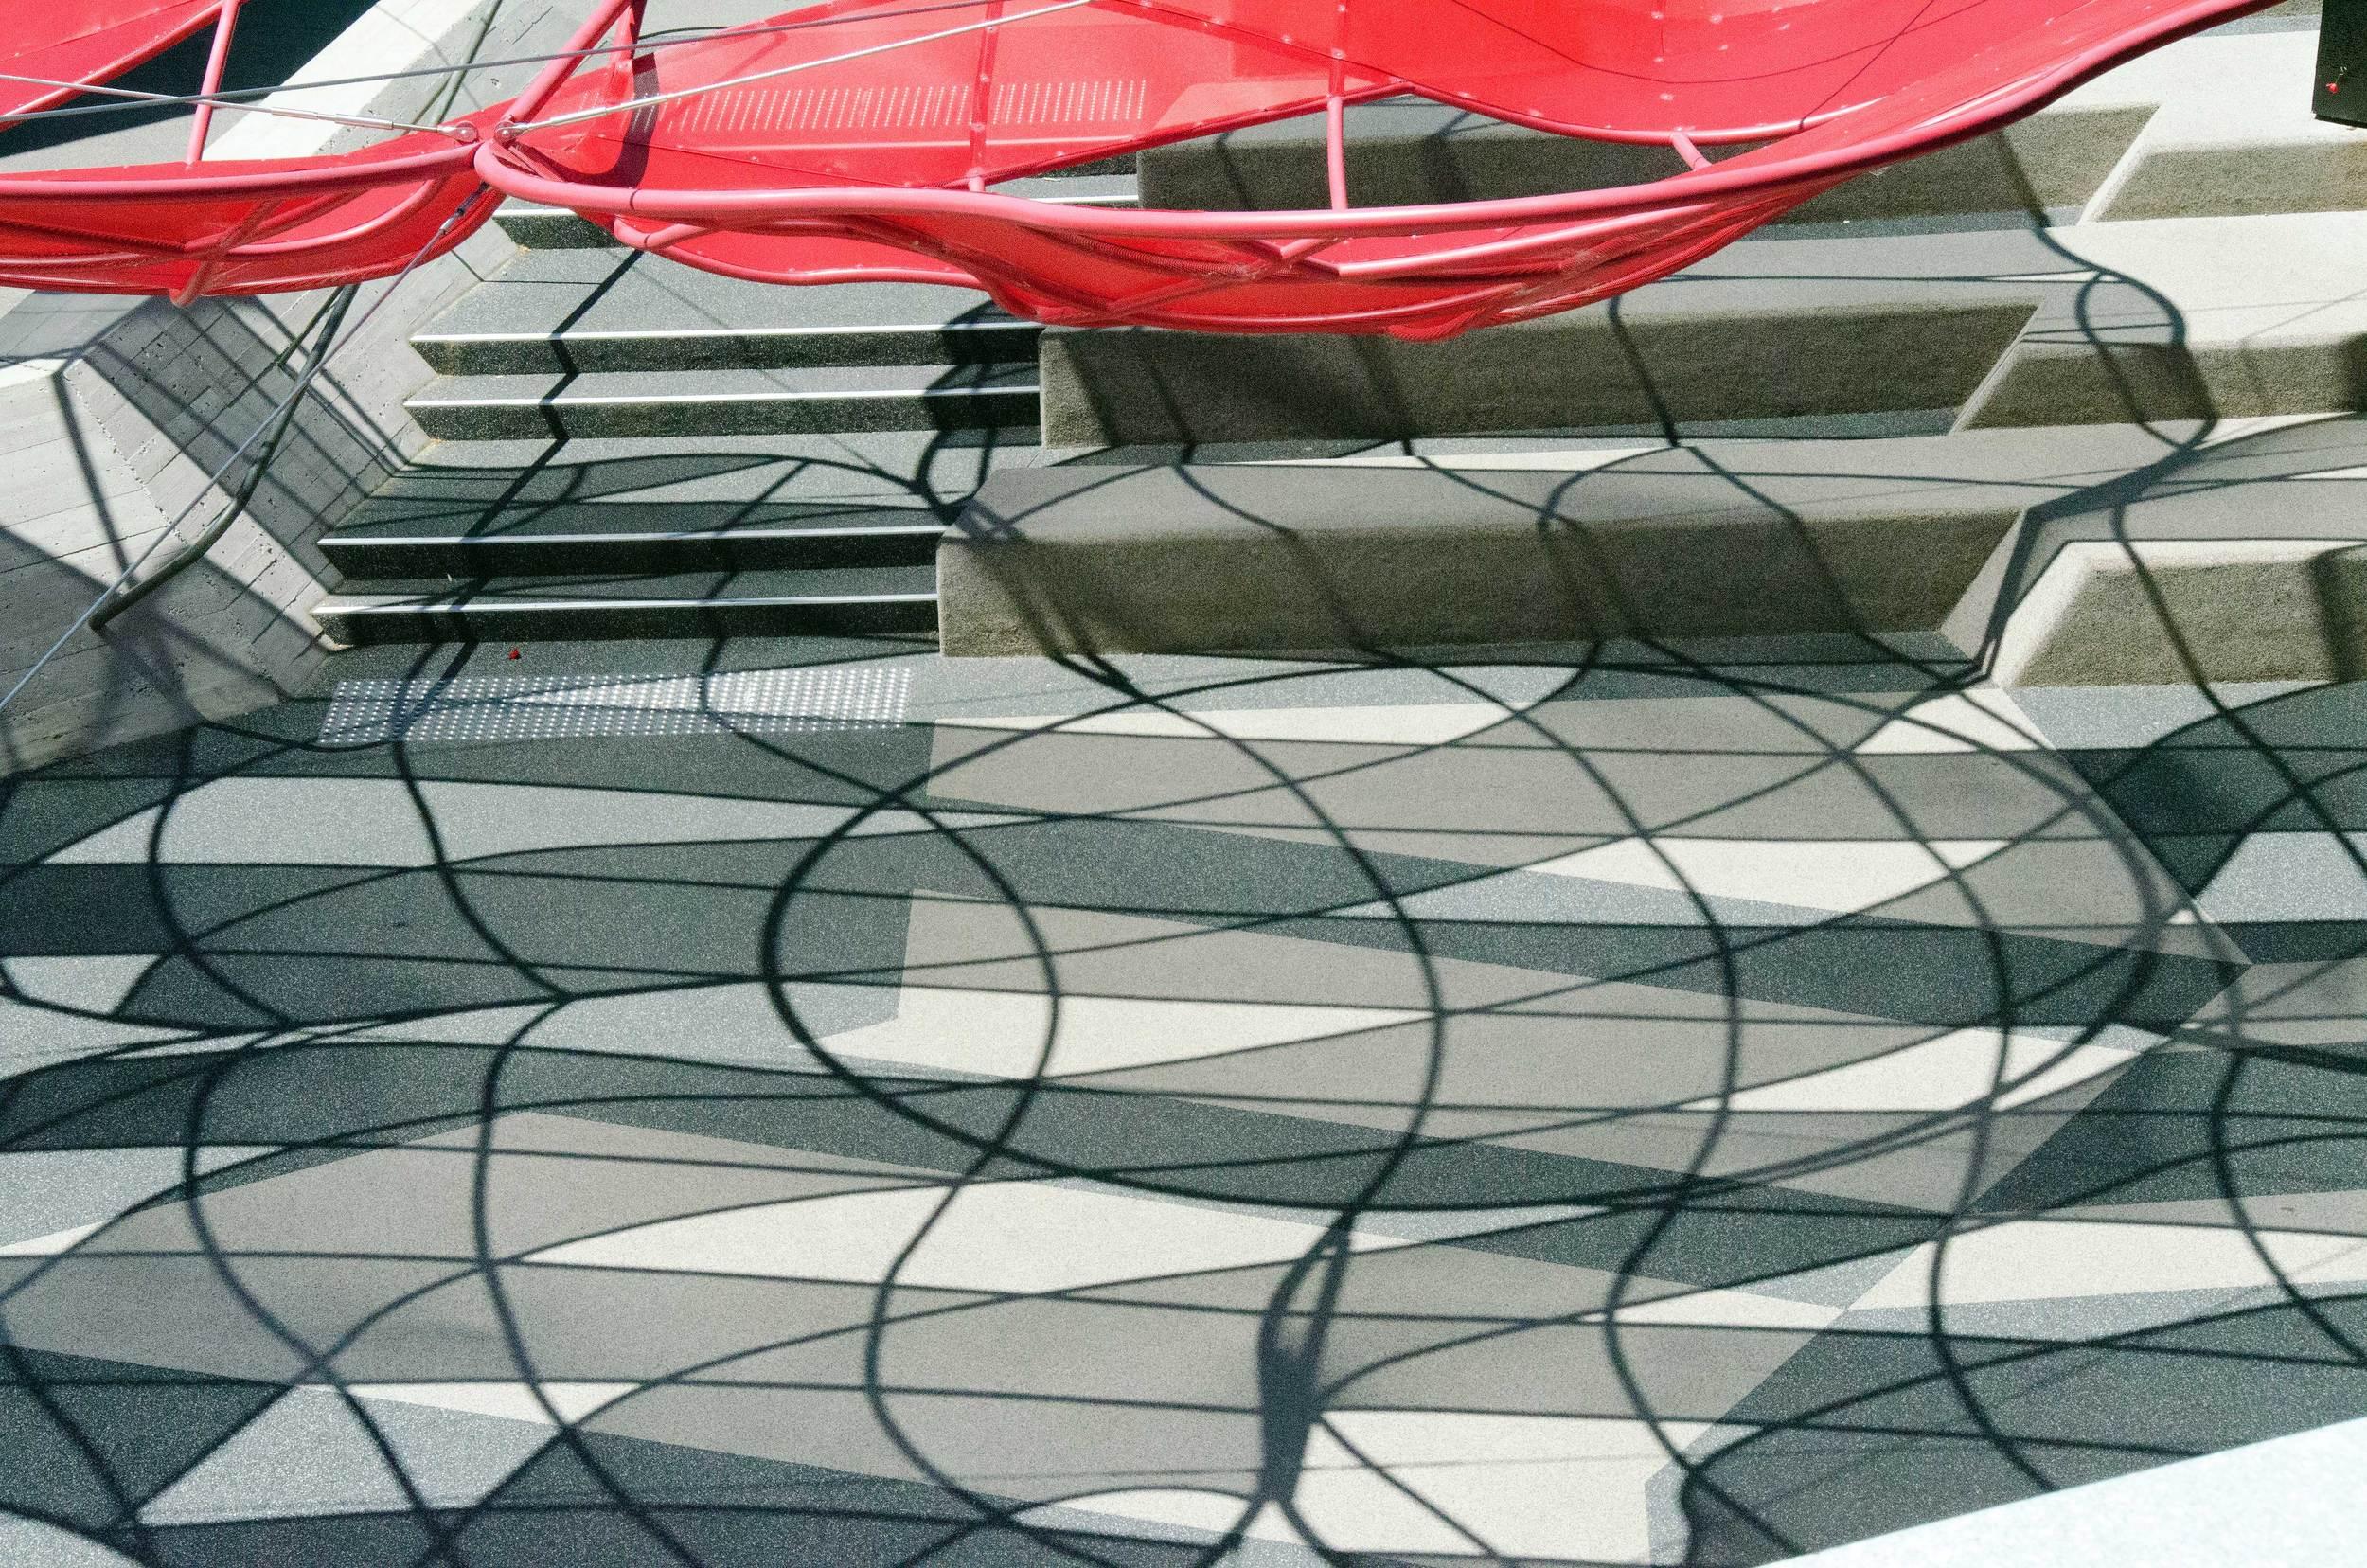 Poppy Umbrella in Shrine of Remembrance Courtyard - Melbourne, Australia